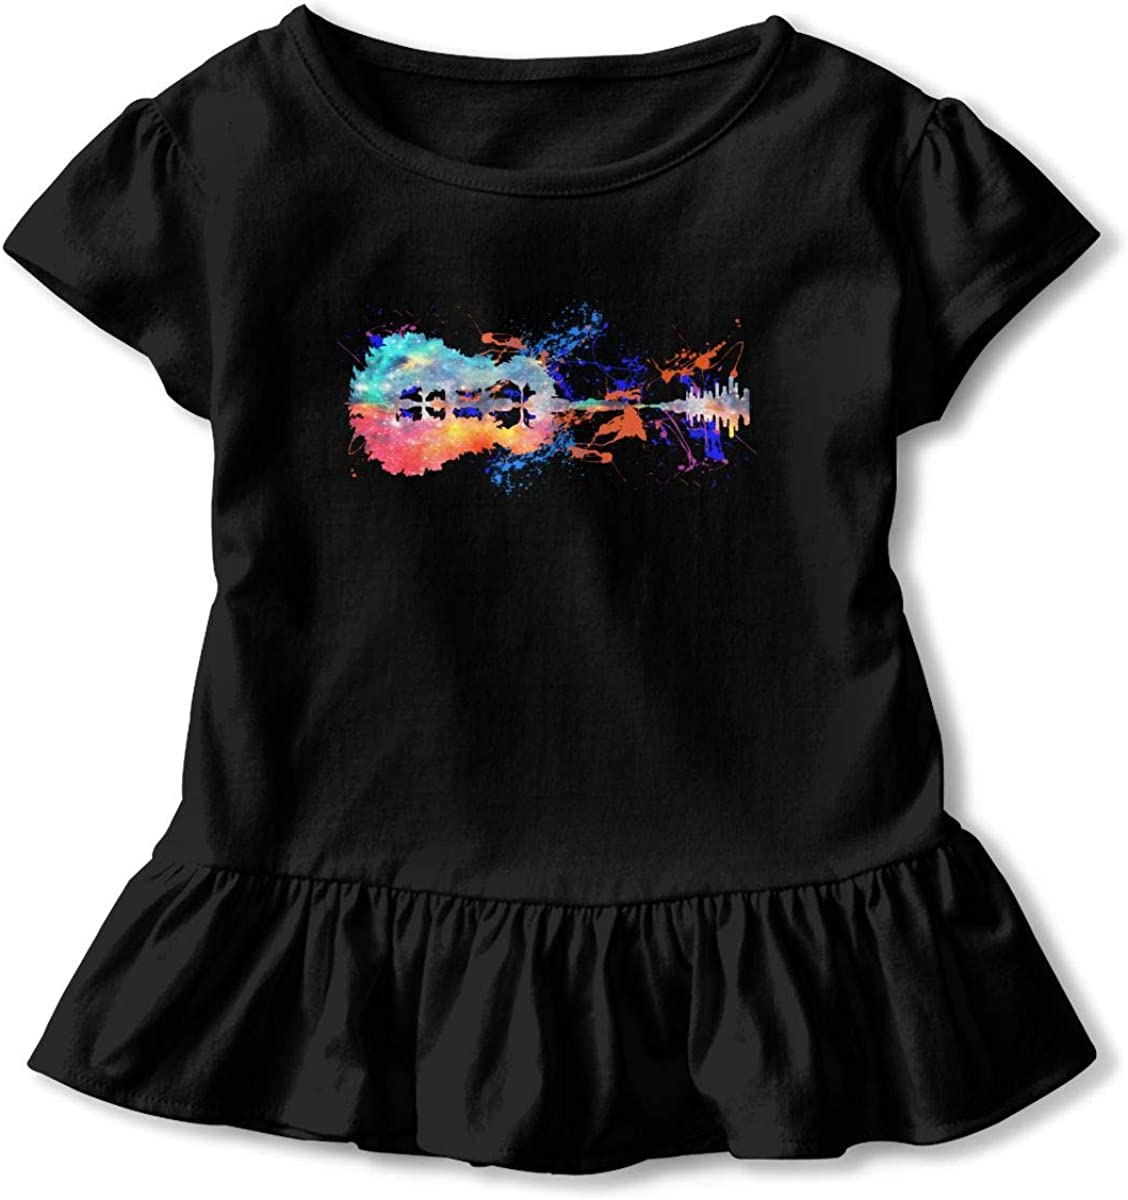 Nature Space Guitar Watercolor Toddler Girls T Shirt Kids Cotton Short Sleeve Ruffle Tee